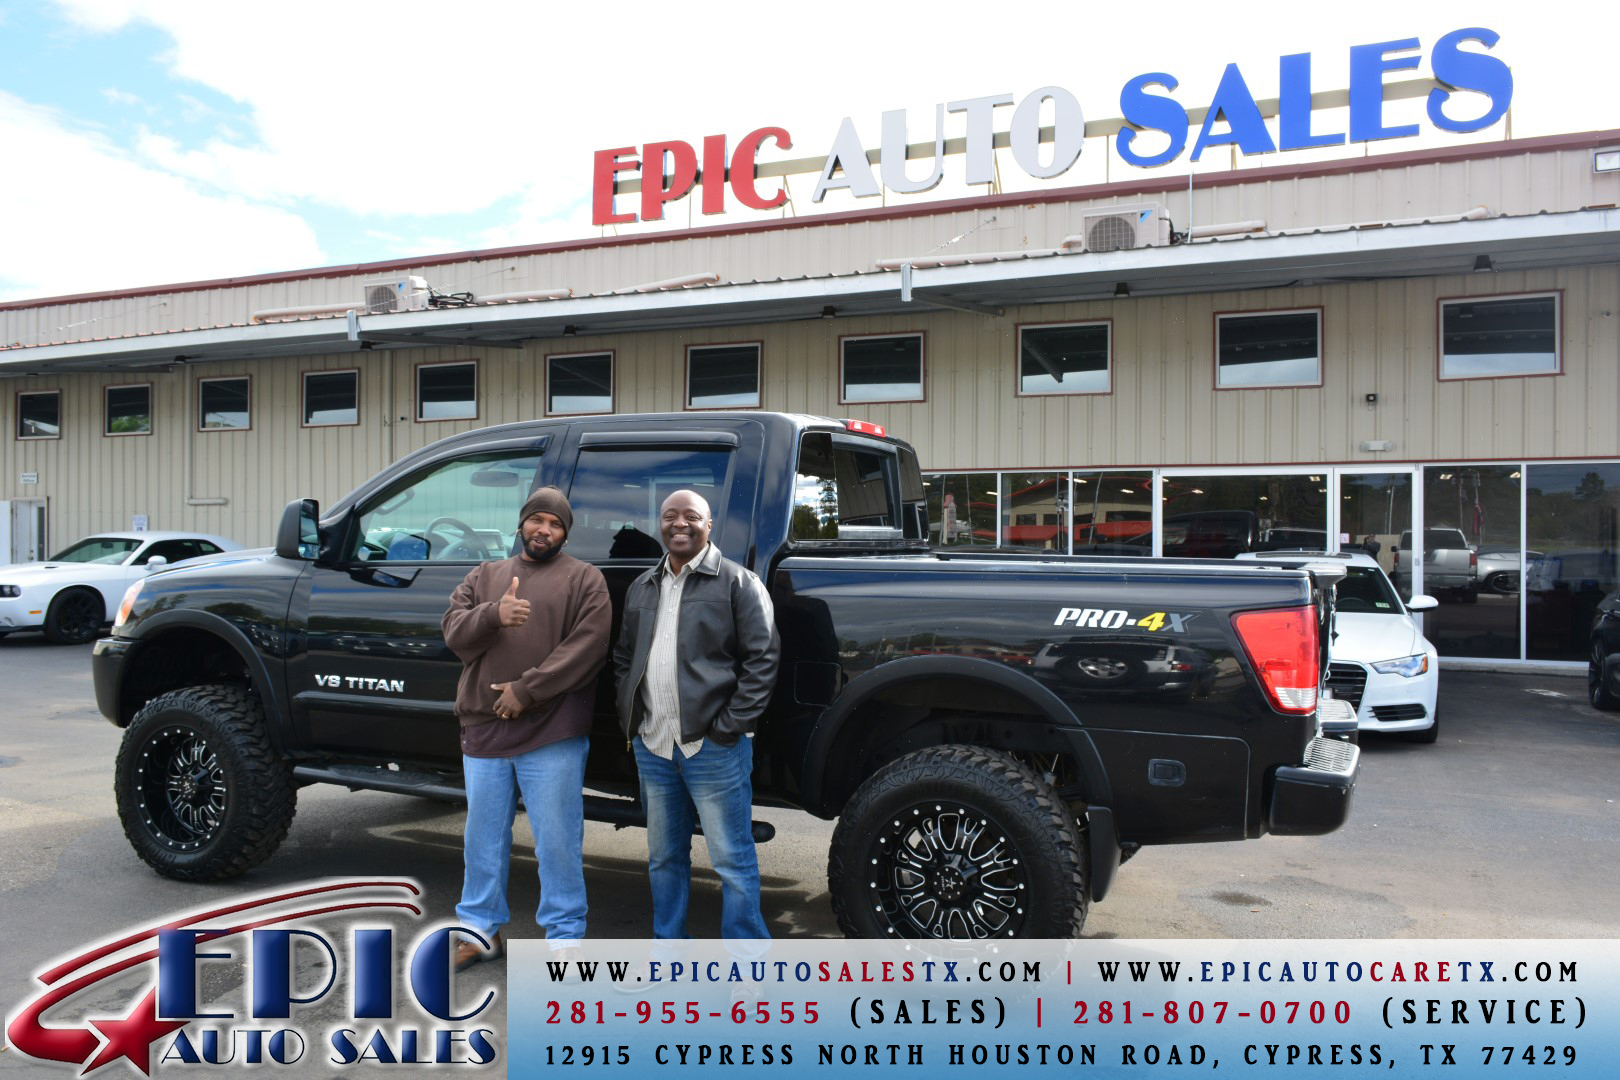 Epic Auto Sales, Cypress Texas (TX) - LocalDatabase.com